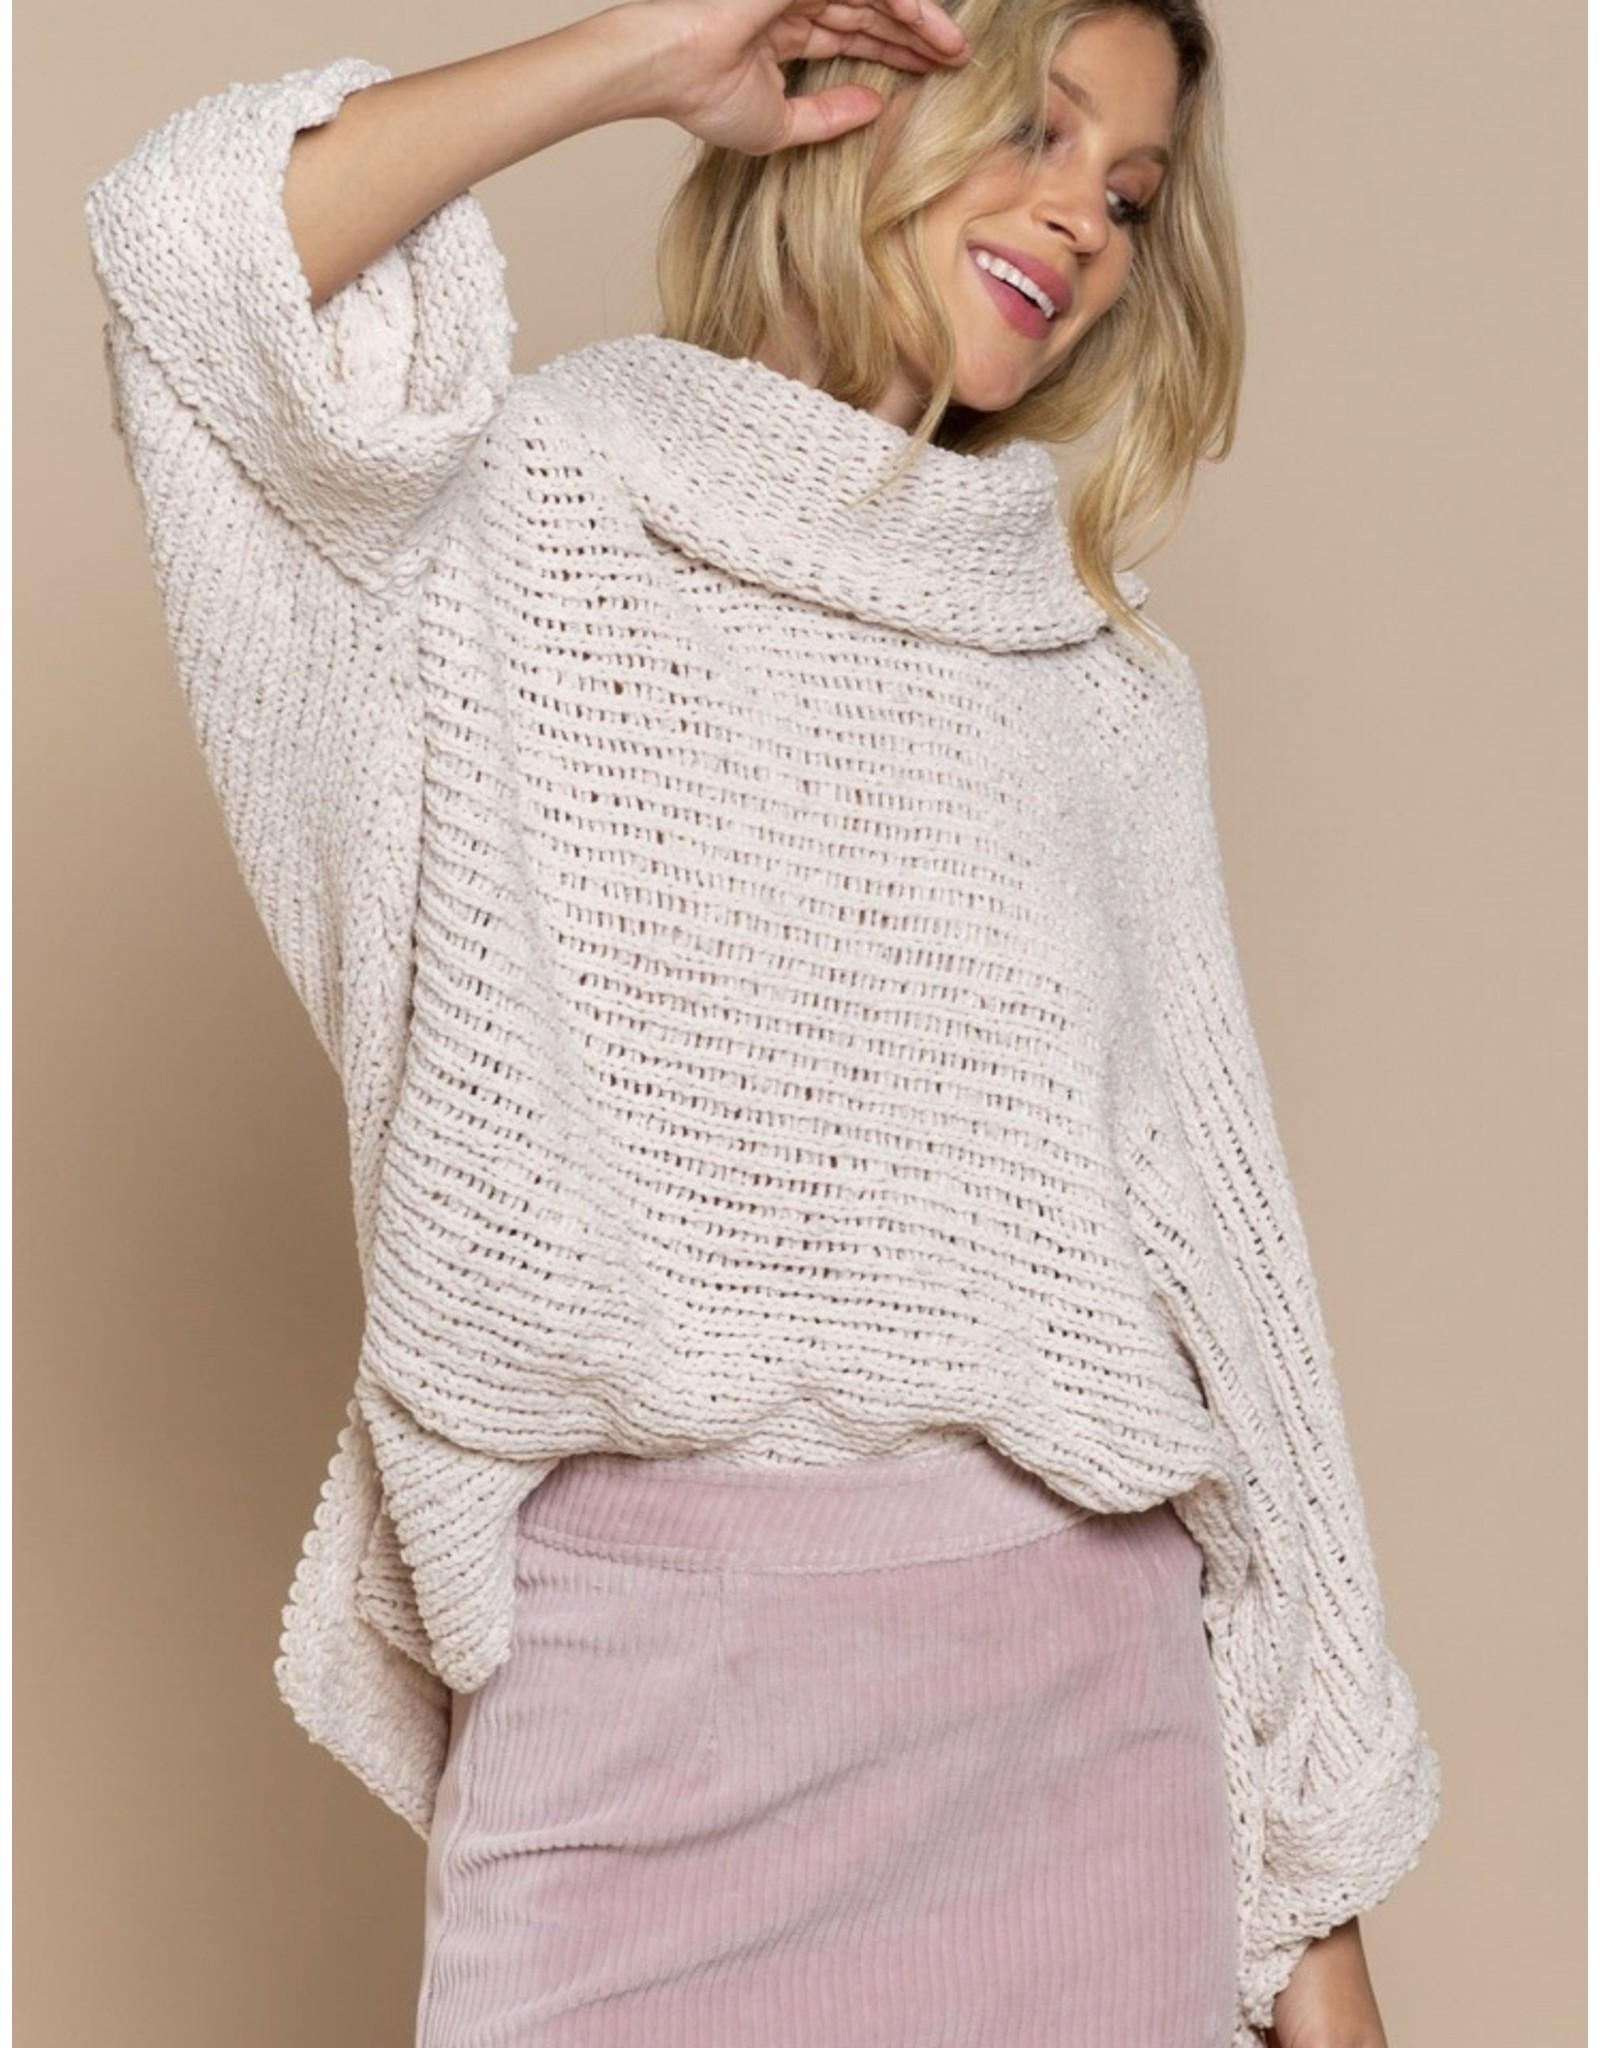 Oversized Turtleneck Sweater - Cream